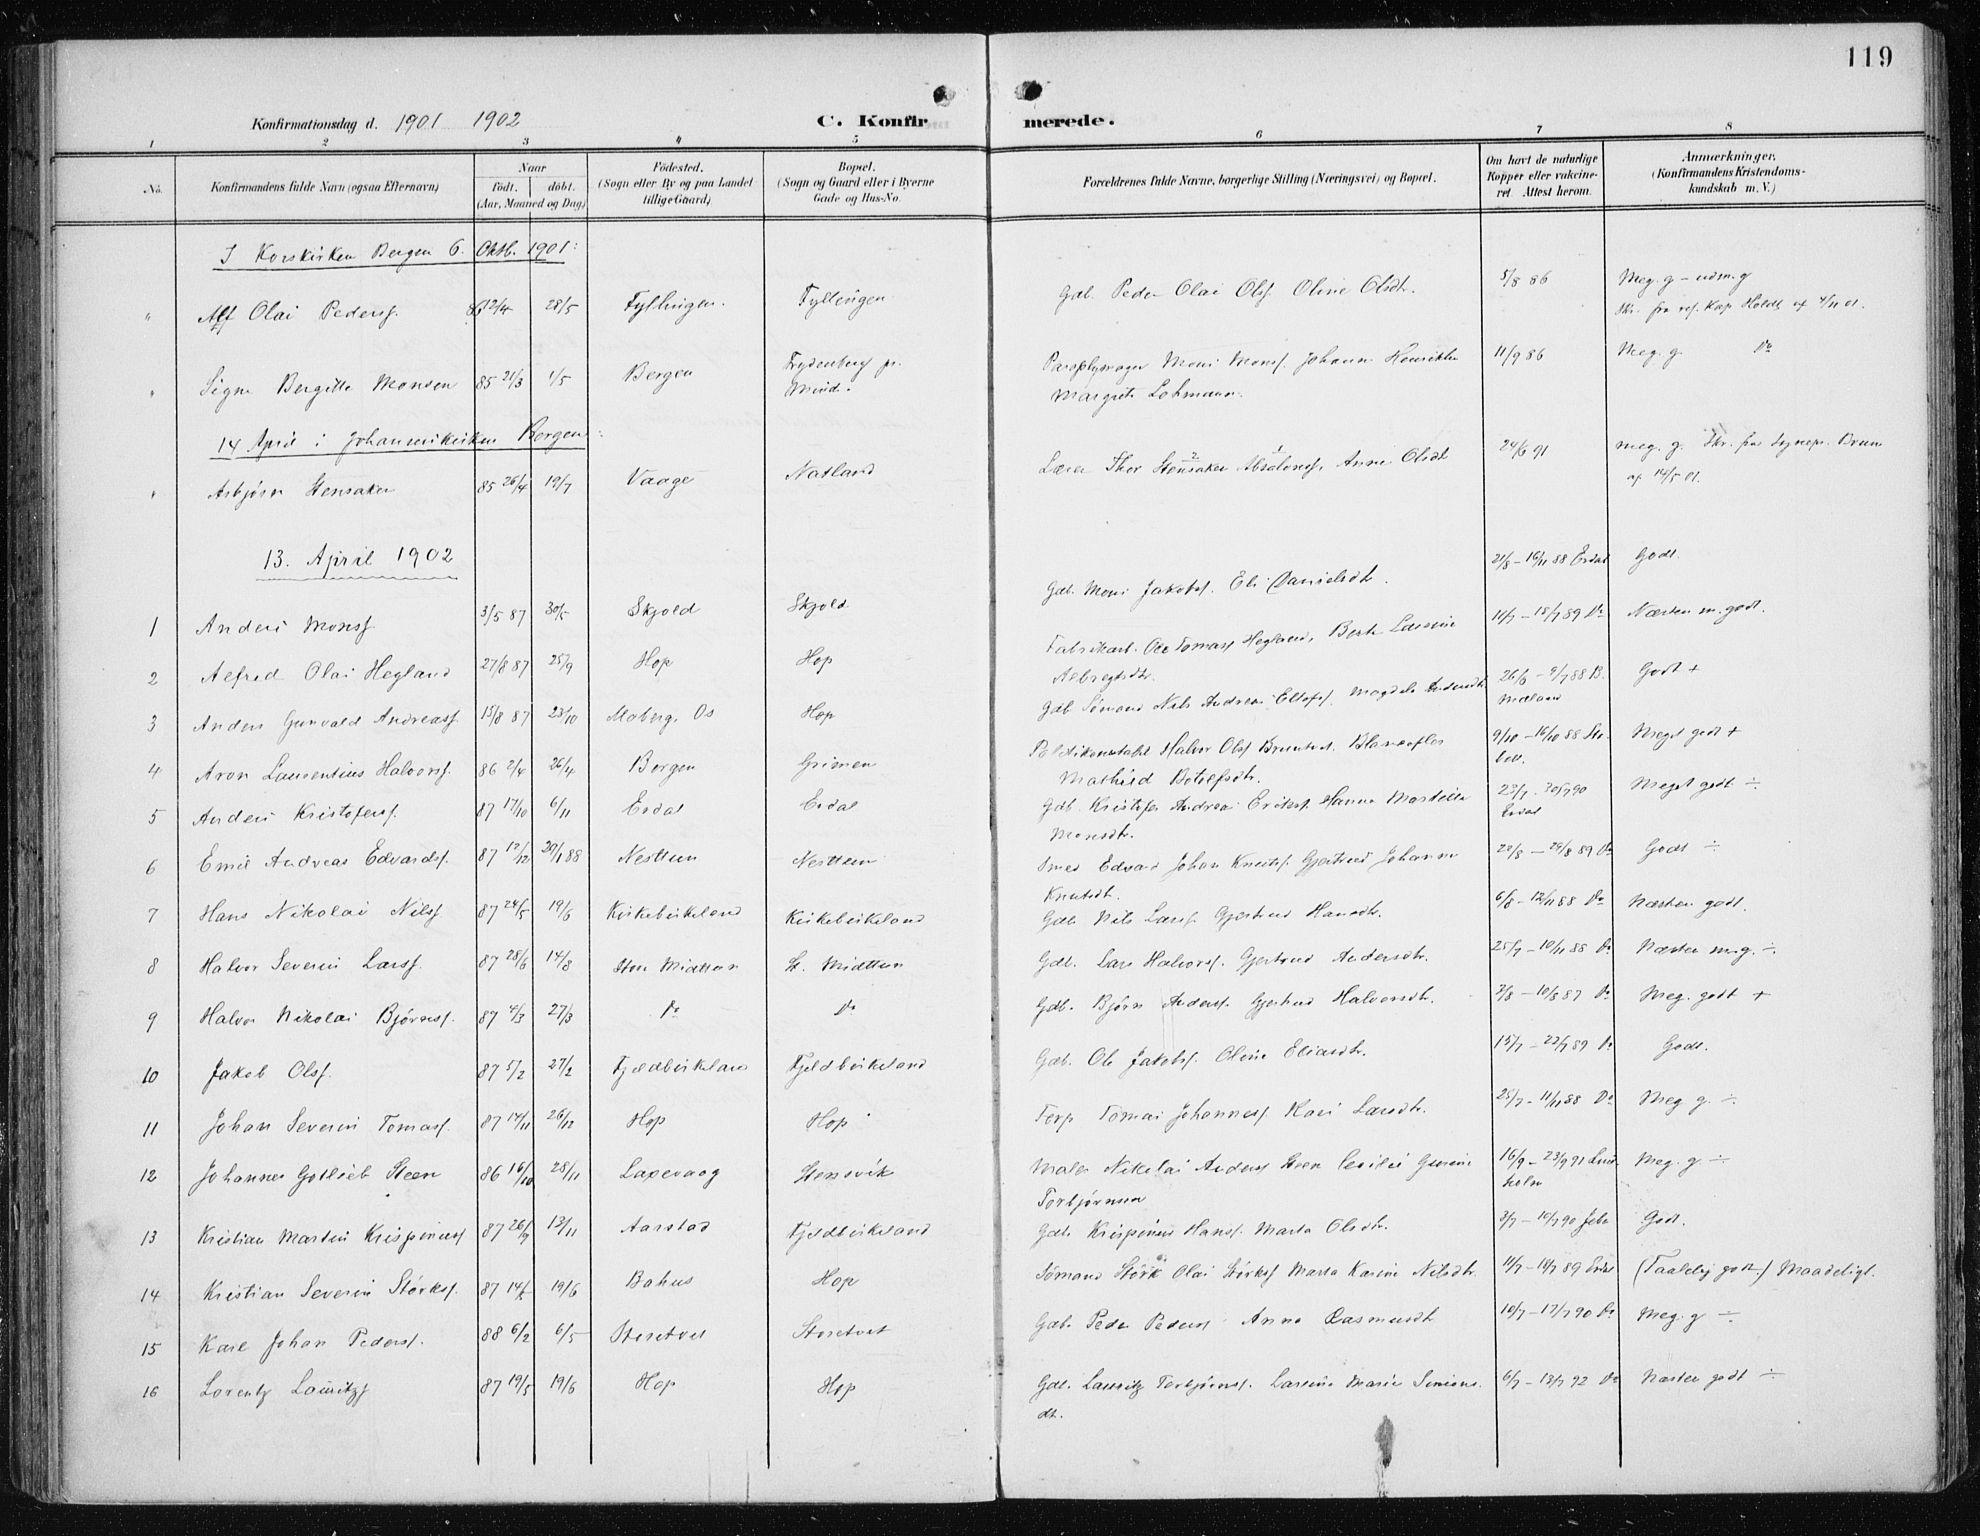 SAB, Fana Sokneprestembete, H/Haa/Haai/L0003: Ministerialbok nr. I 3, 1900-1912, s. 119